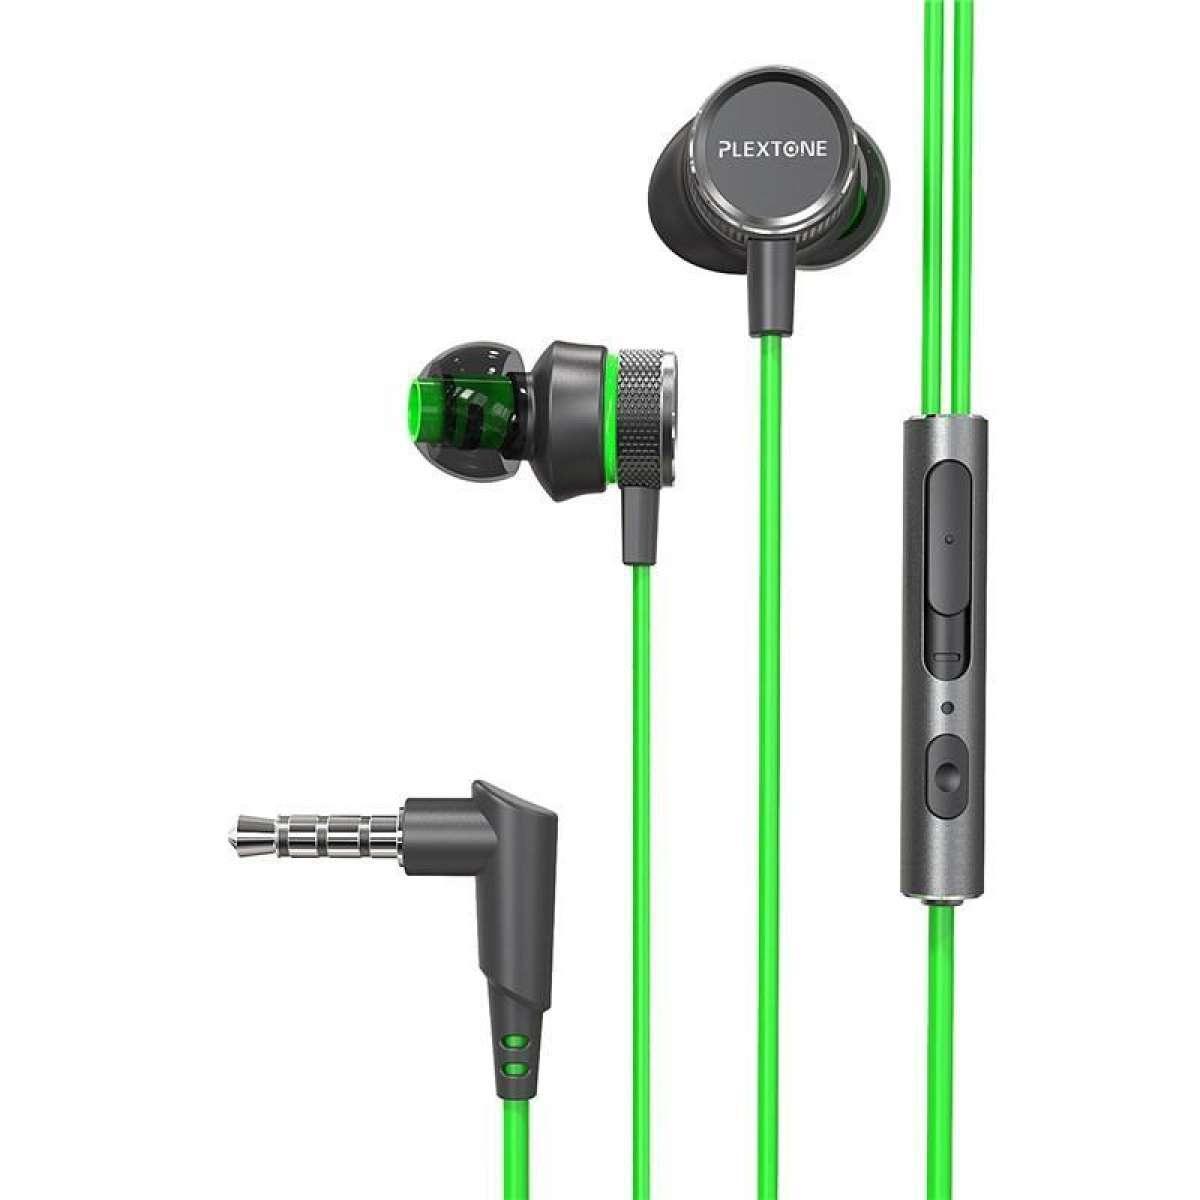 PLEXTONE G15 Earphone 3.5mm Magnetic Stereo Gaming Earohone-Green